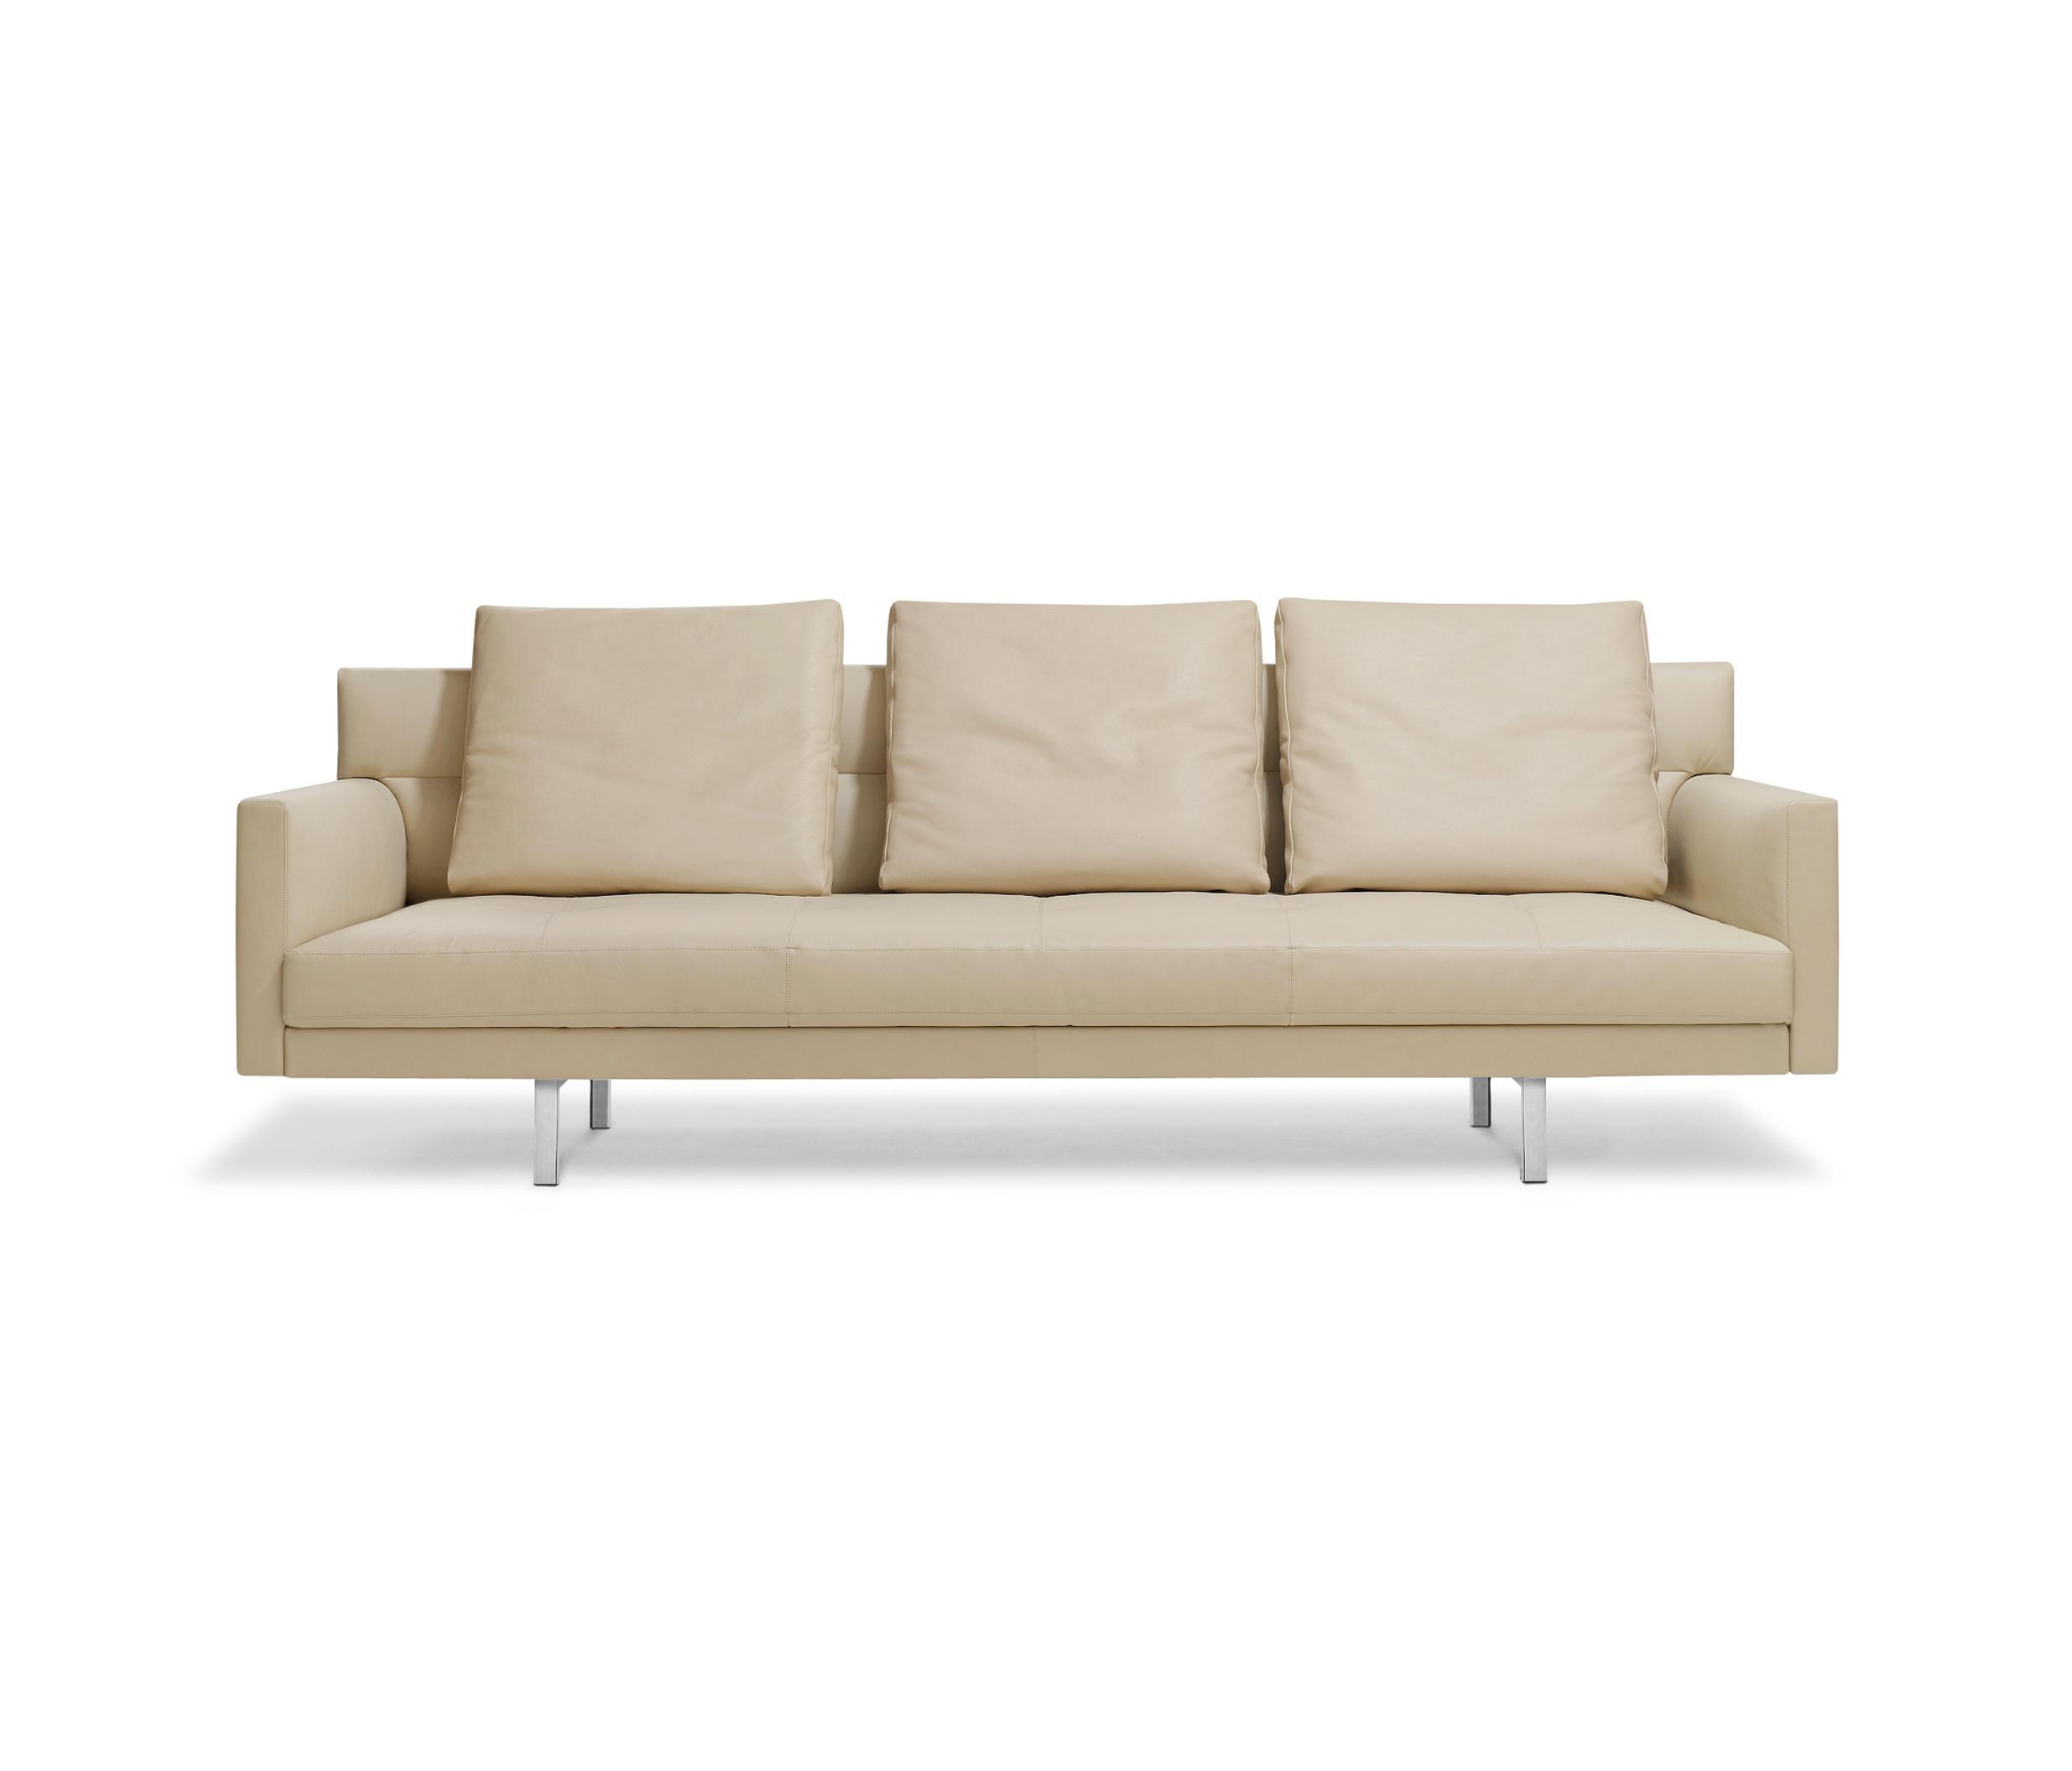 Gordon 495 sofa canap s d 39 attente de walter knoll for Canape walter but